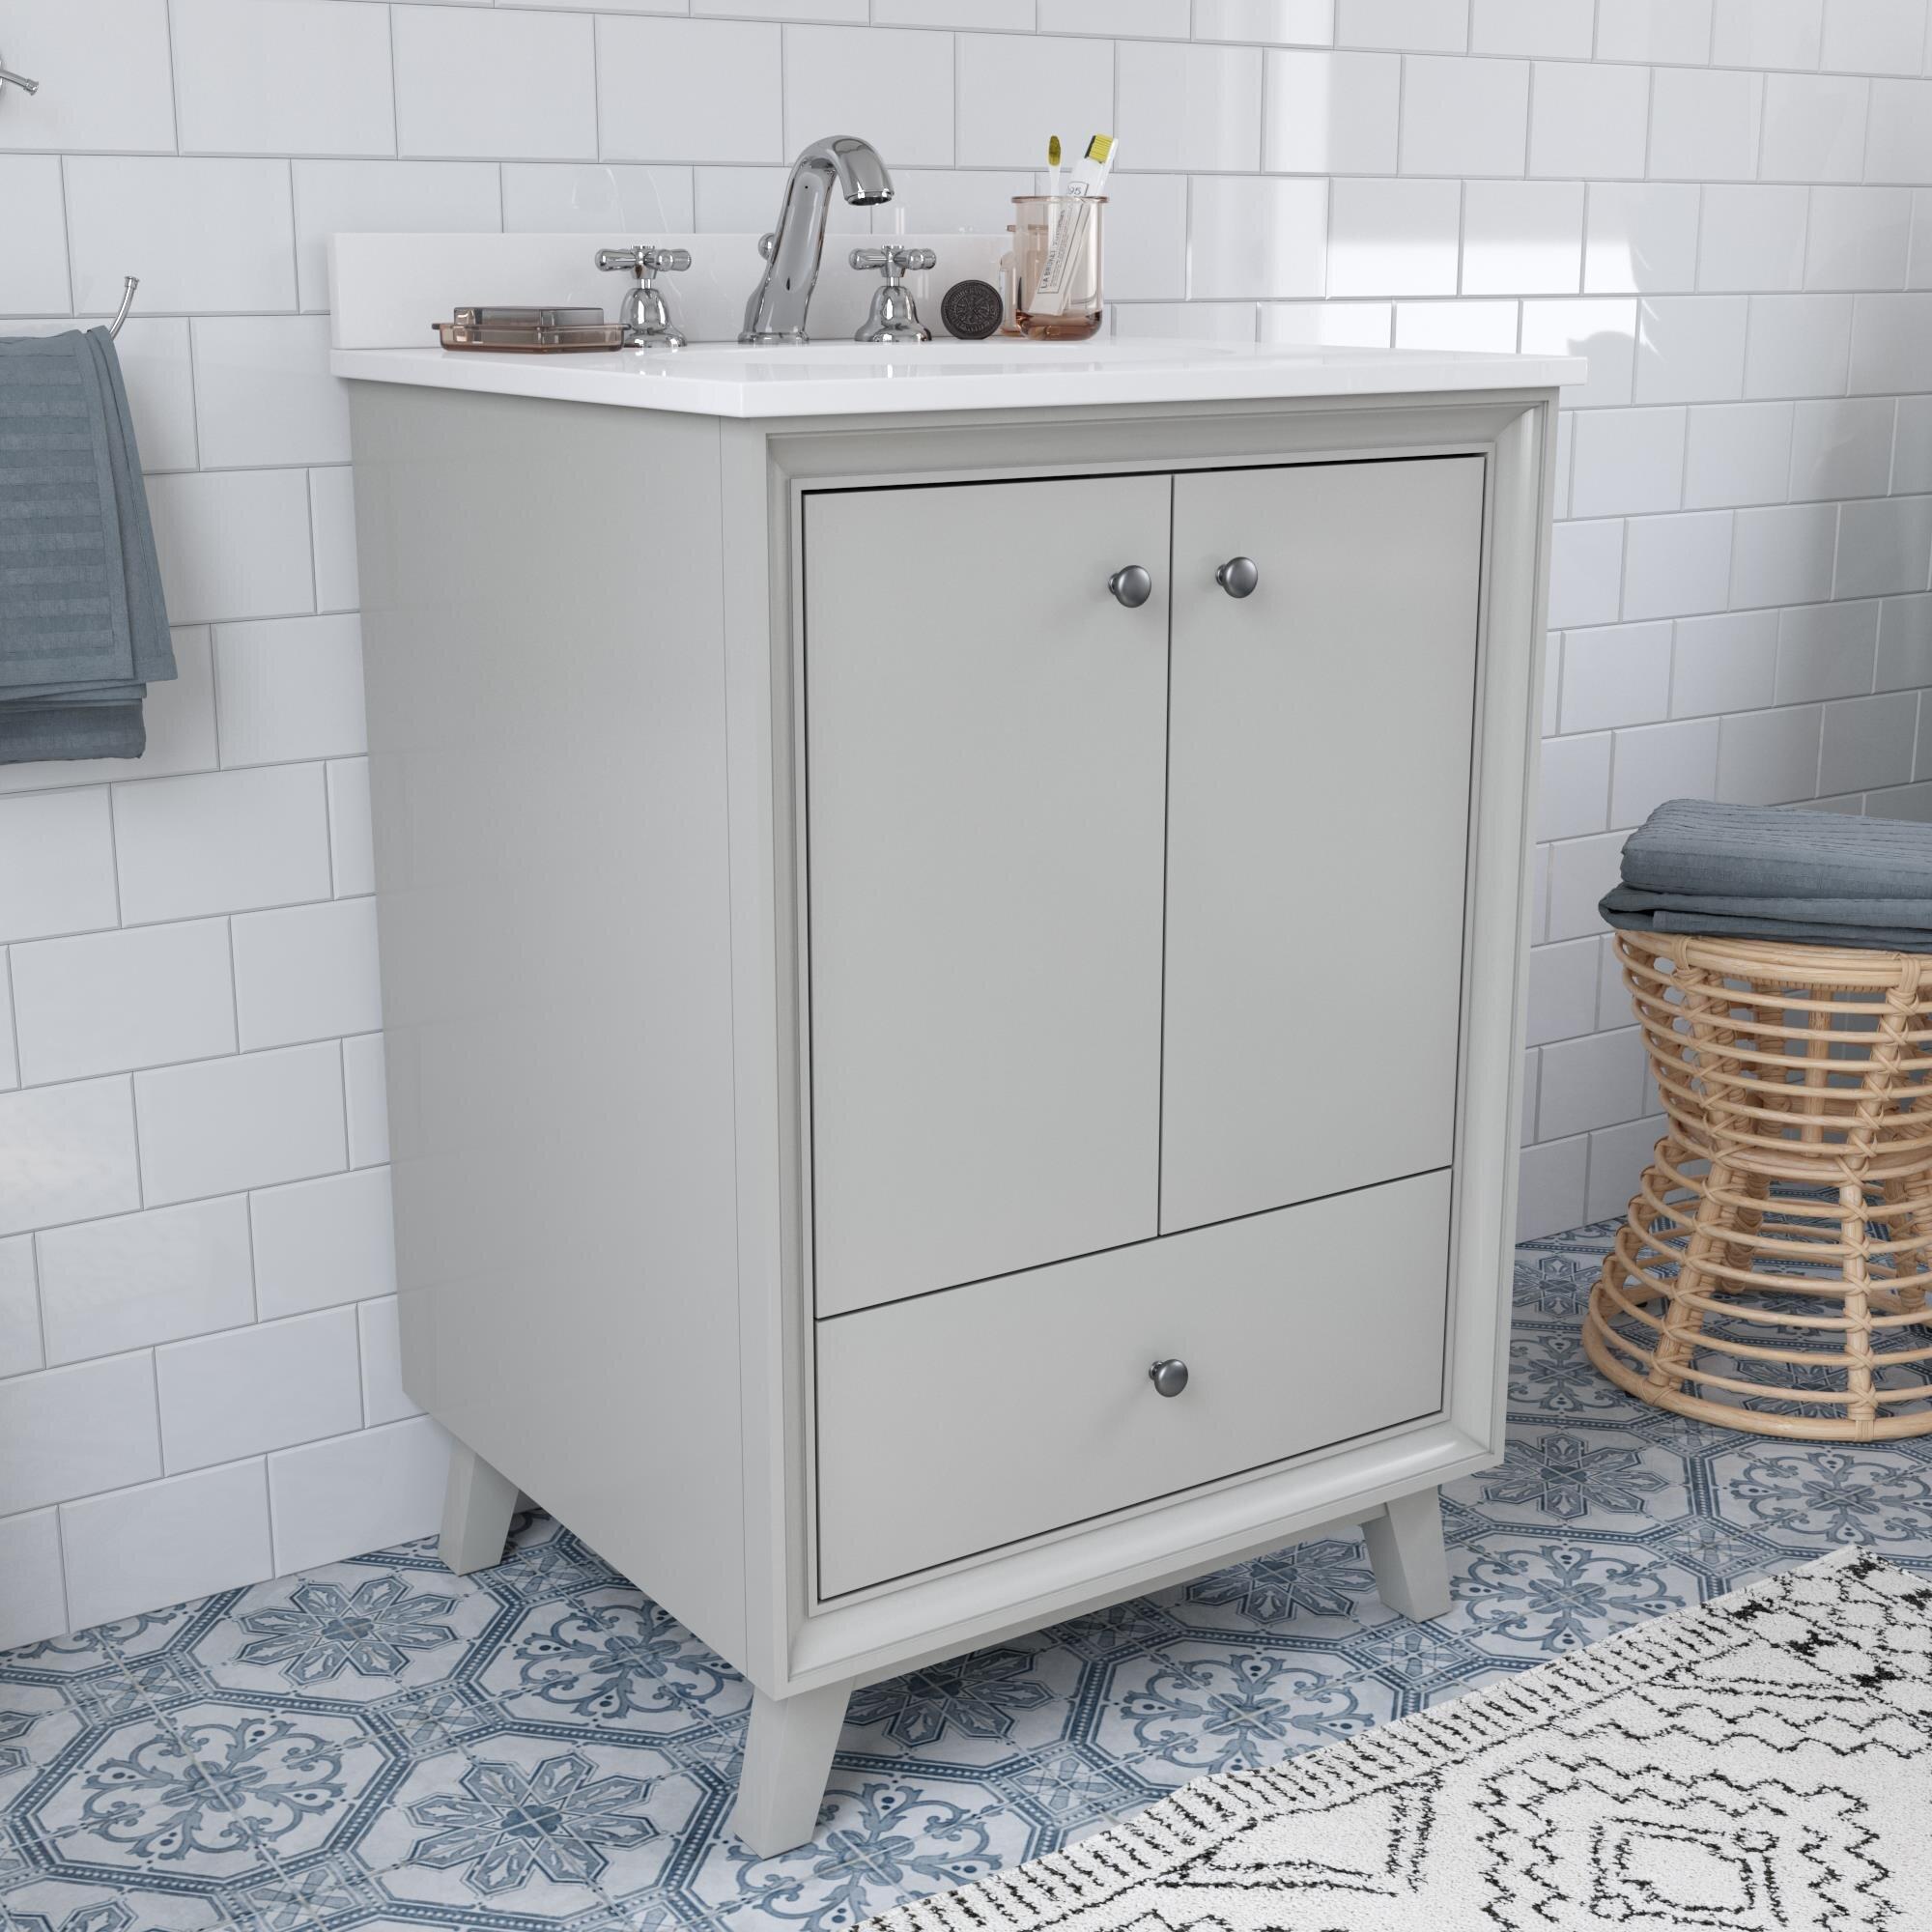 Wood Dorel Living Bathroom Vanities You Ll Love In 2021 Wayfair